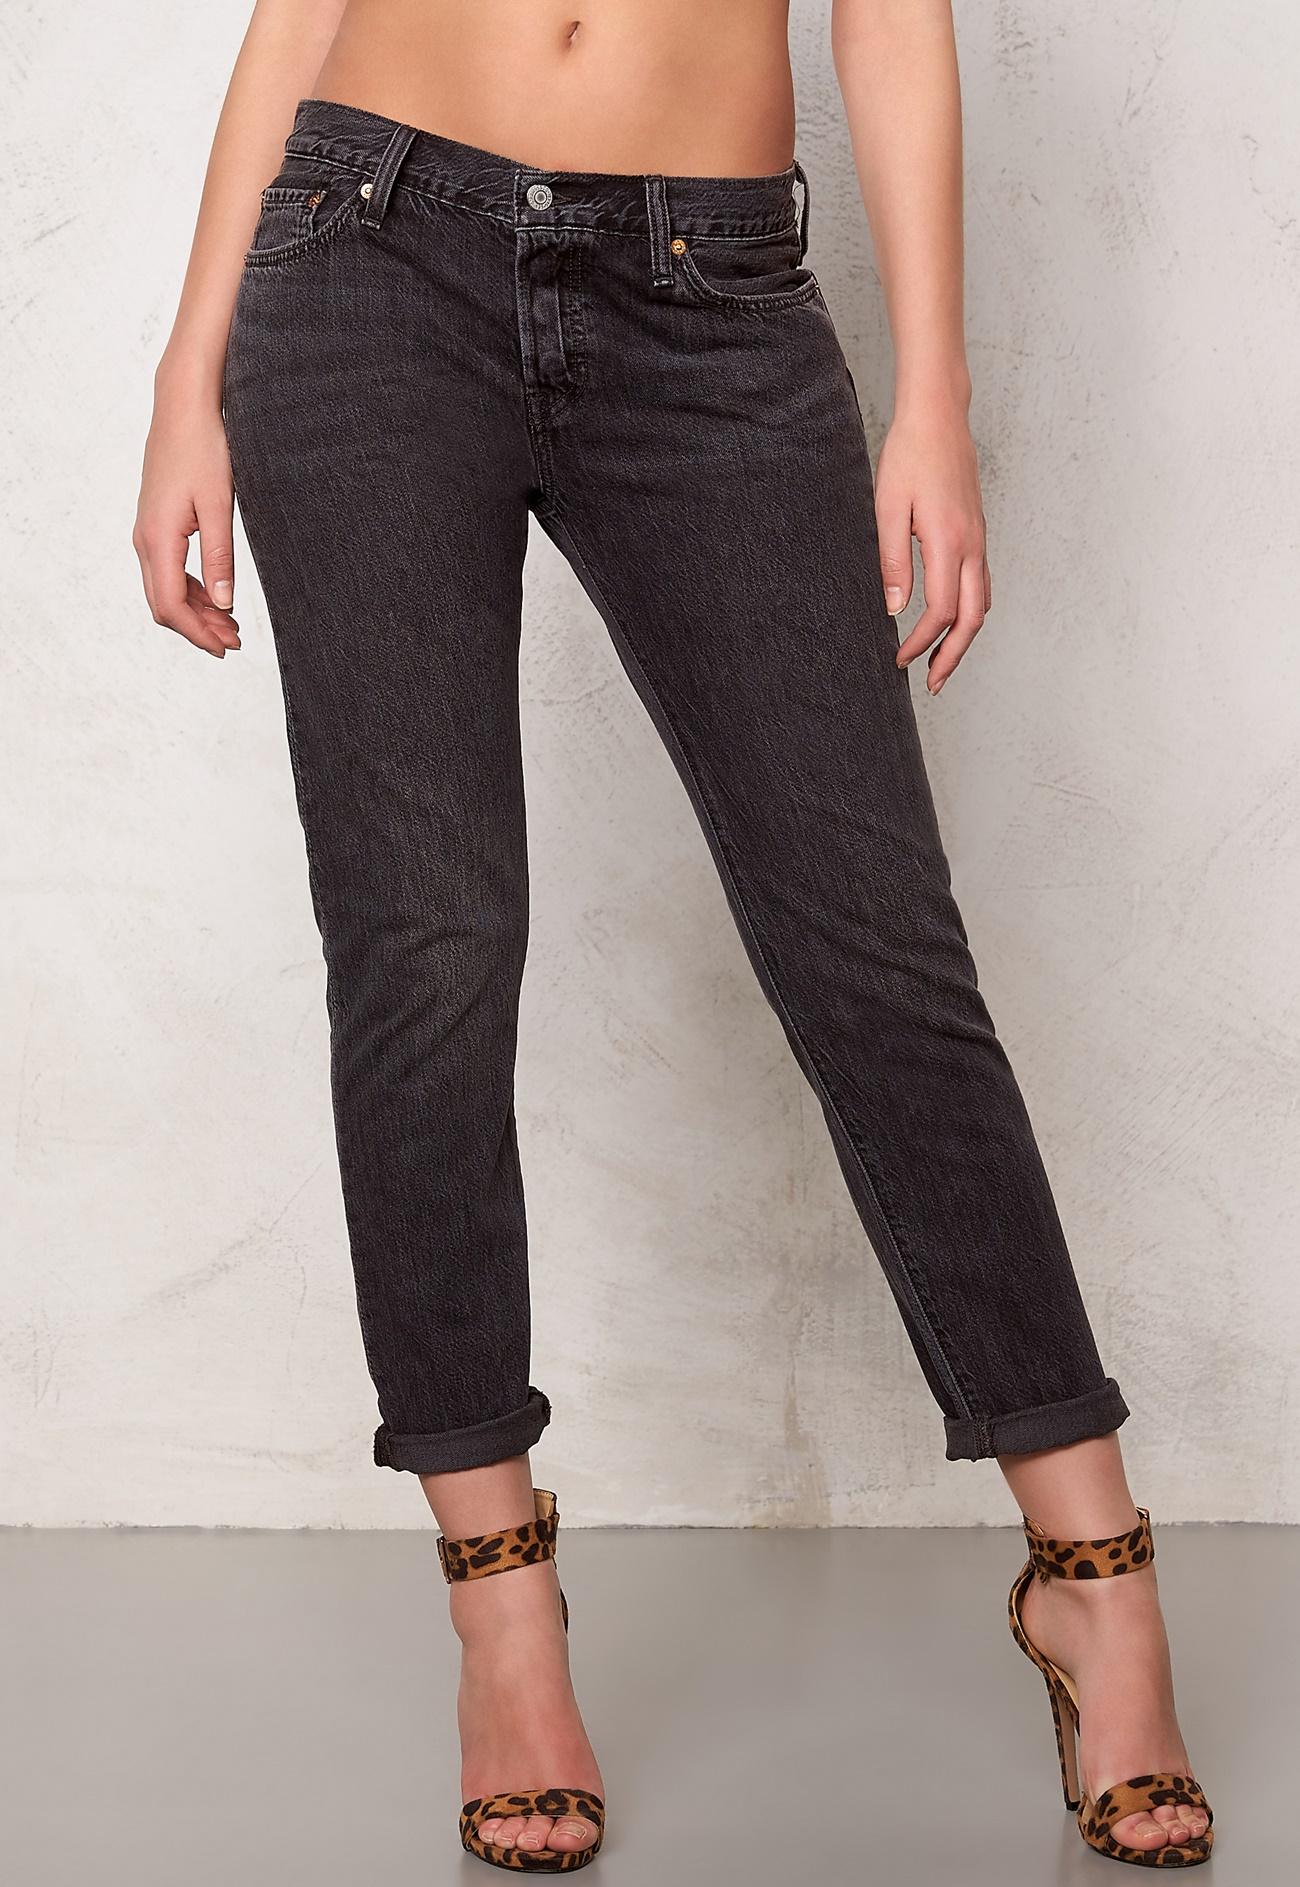 levi 39 s 501 ct jeans denim fading coal bubbleroom. Black Bedroom Furniture Sets. Home Design Ideas